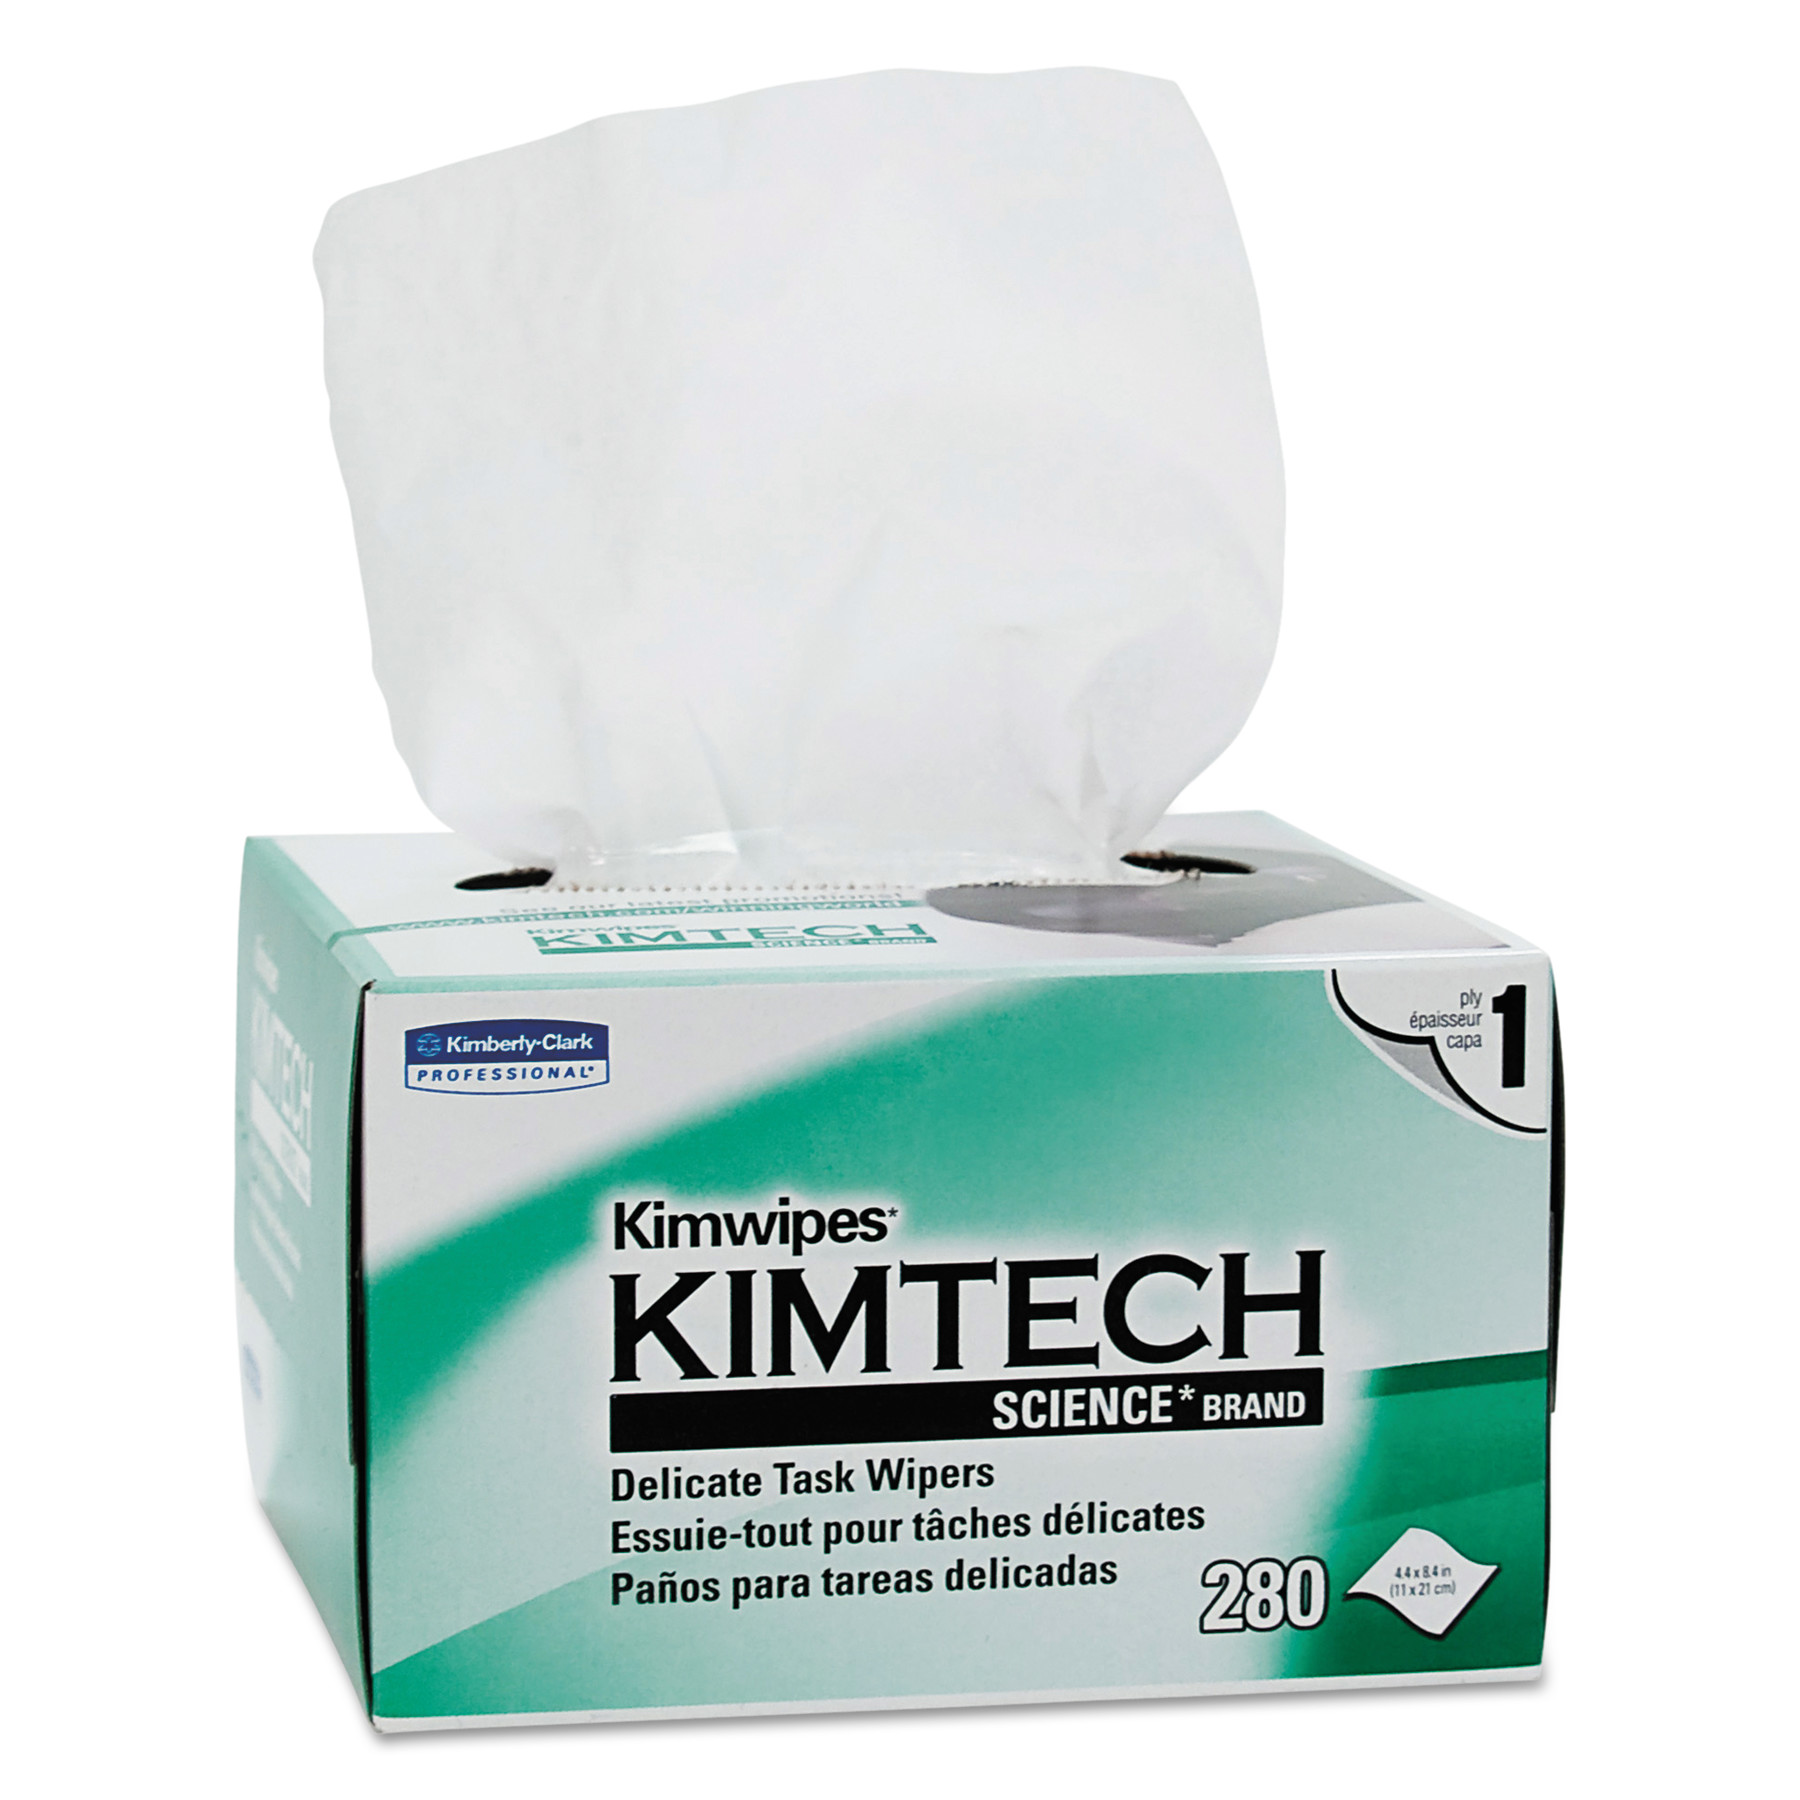 Kimtech* KIMWIPES Delicate Task Wipers, 1-Ply, 4 2/5 x 8 2/5, 280/Box, 30 Boxes/Carton